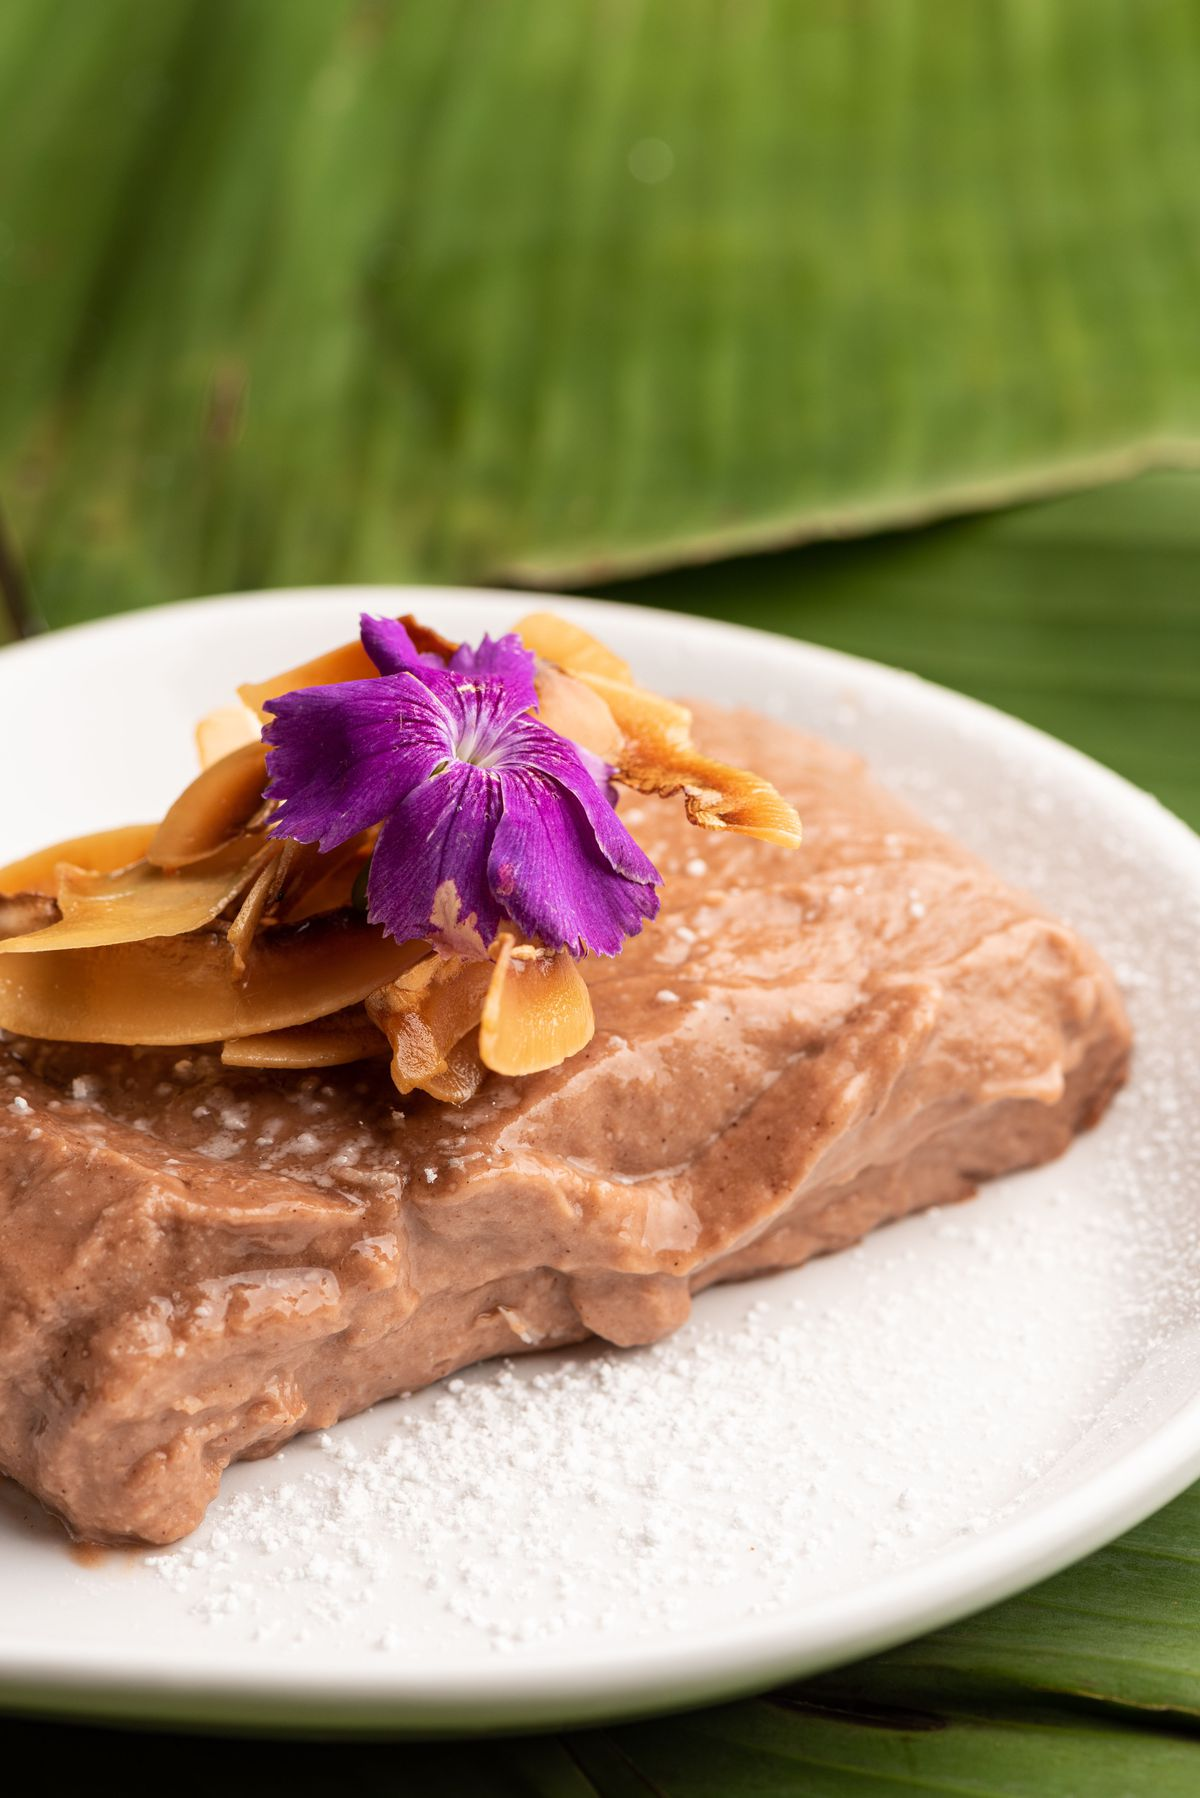 Tembleque, Puerto Rican panna cotta, chocolate coconut with powdered sugar